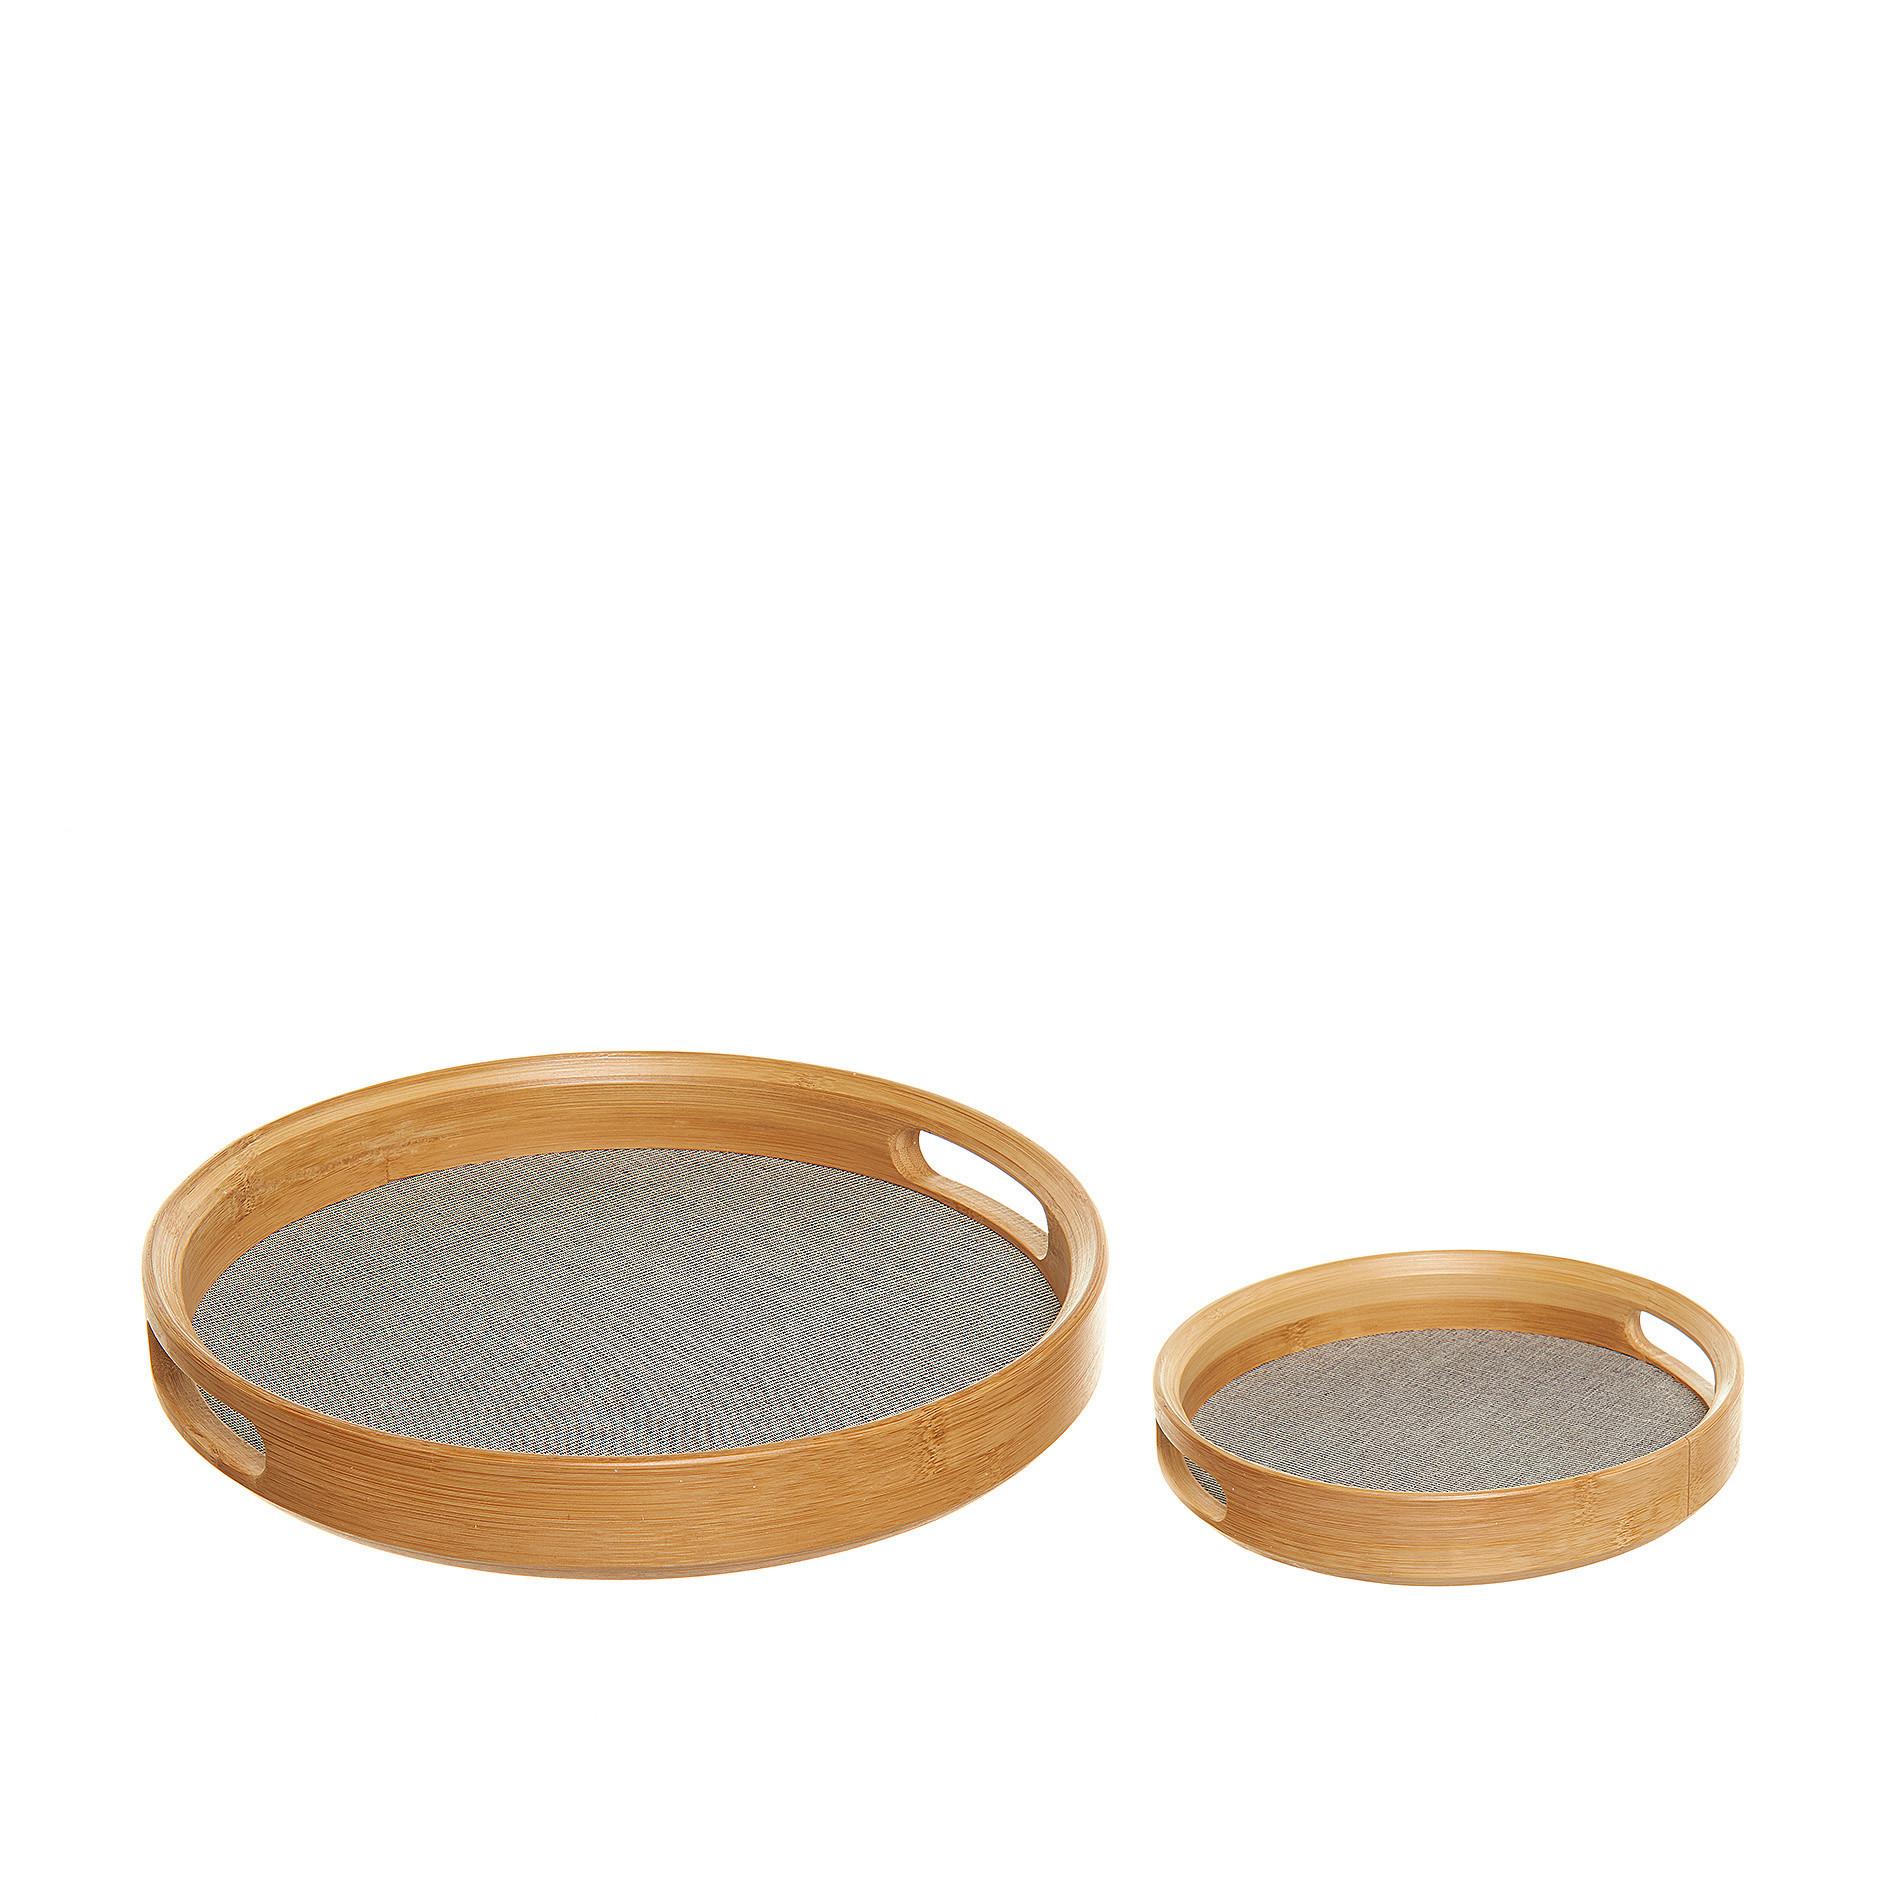 Vassoio rotondo in bamboo e cotone, Grigio, large image number 1